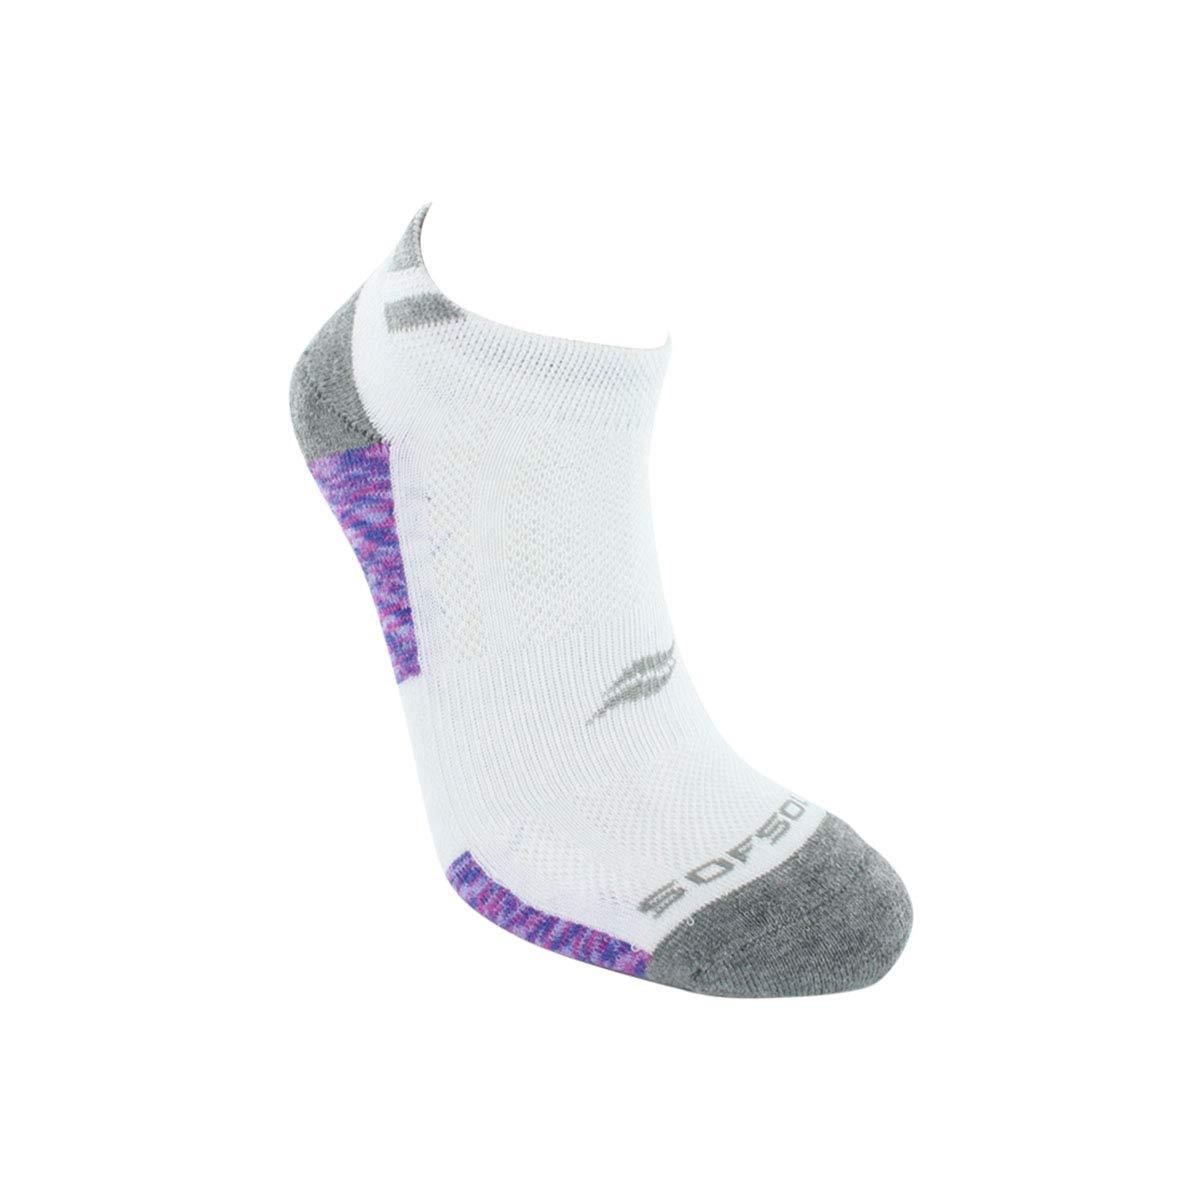 SofSole Socks Womenss Multi Sport Cushion Tab Socks